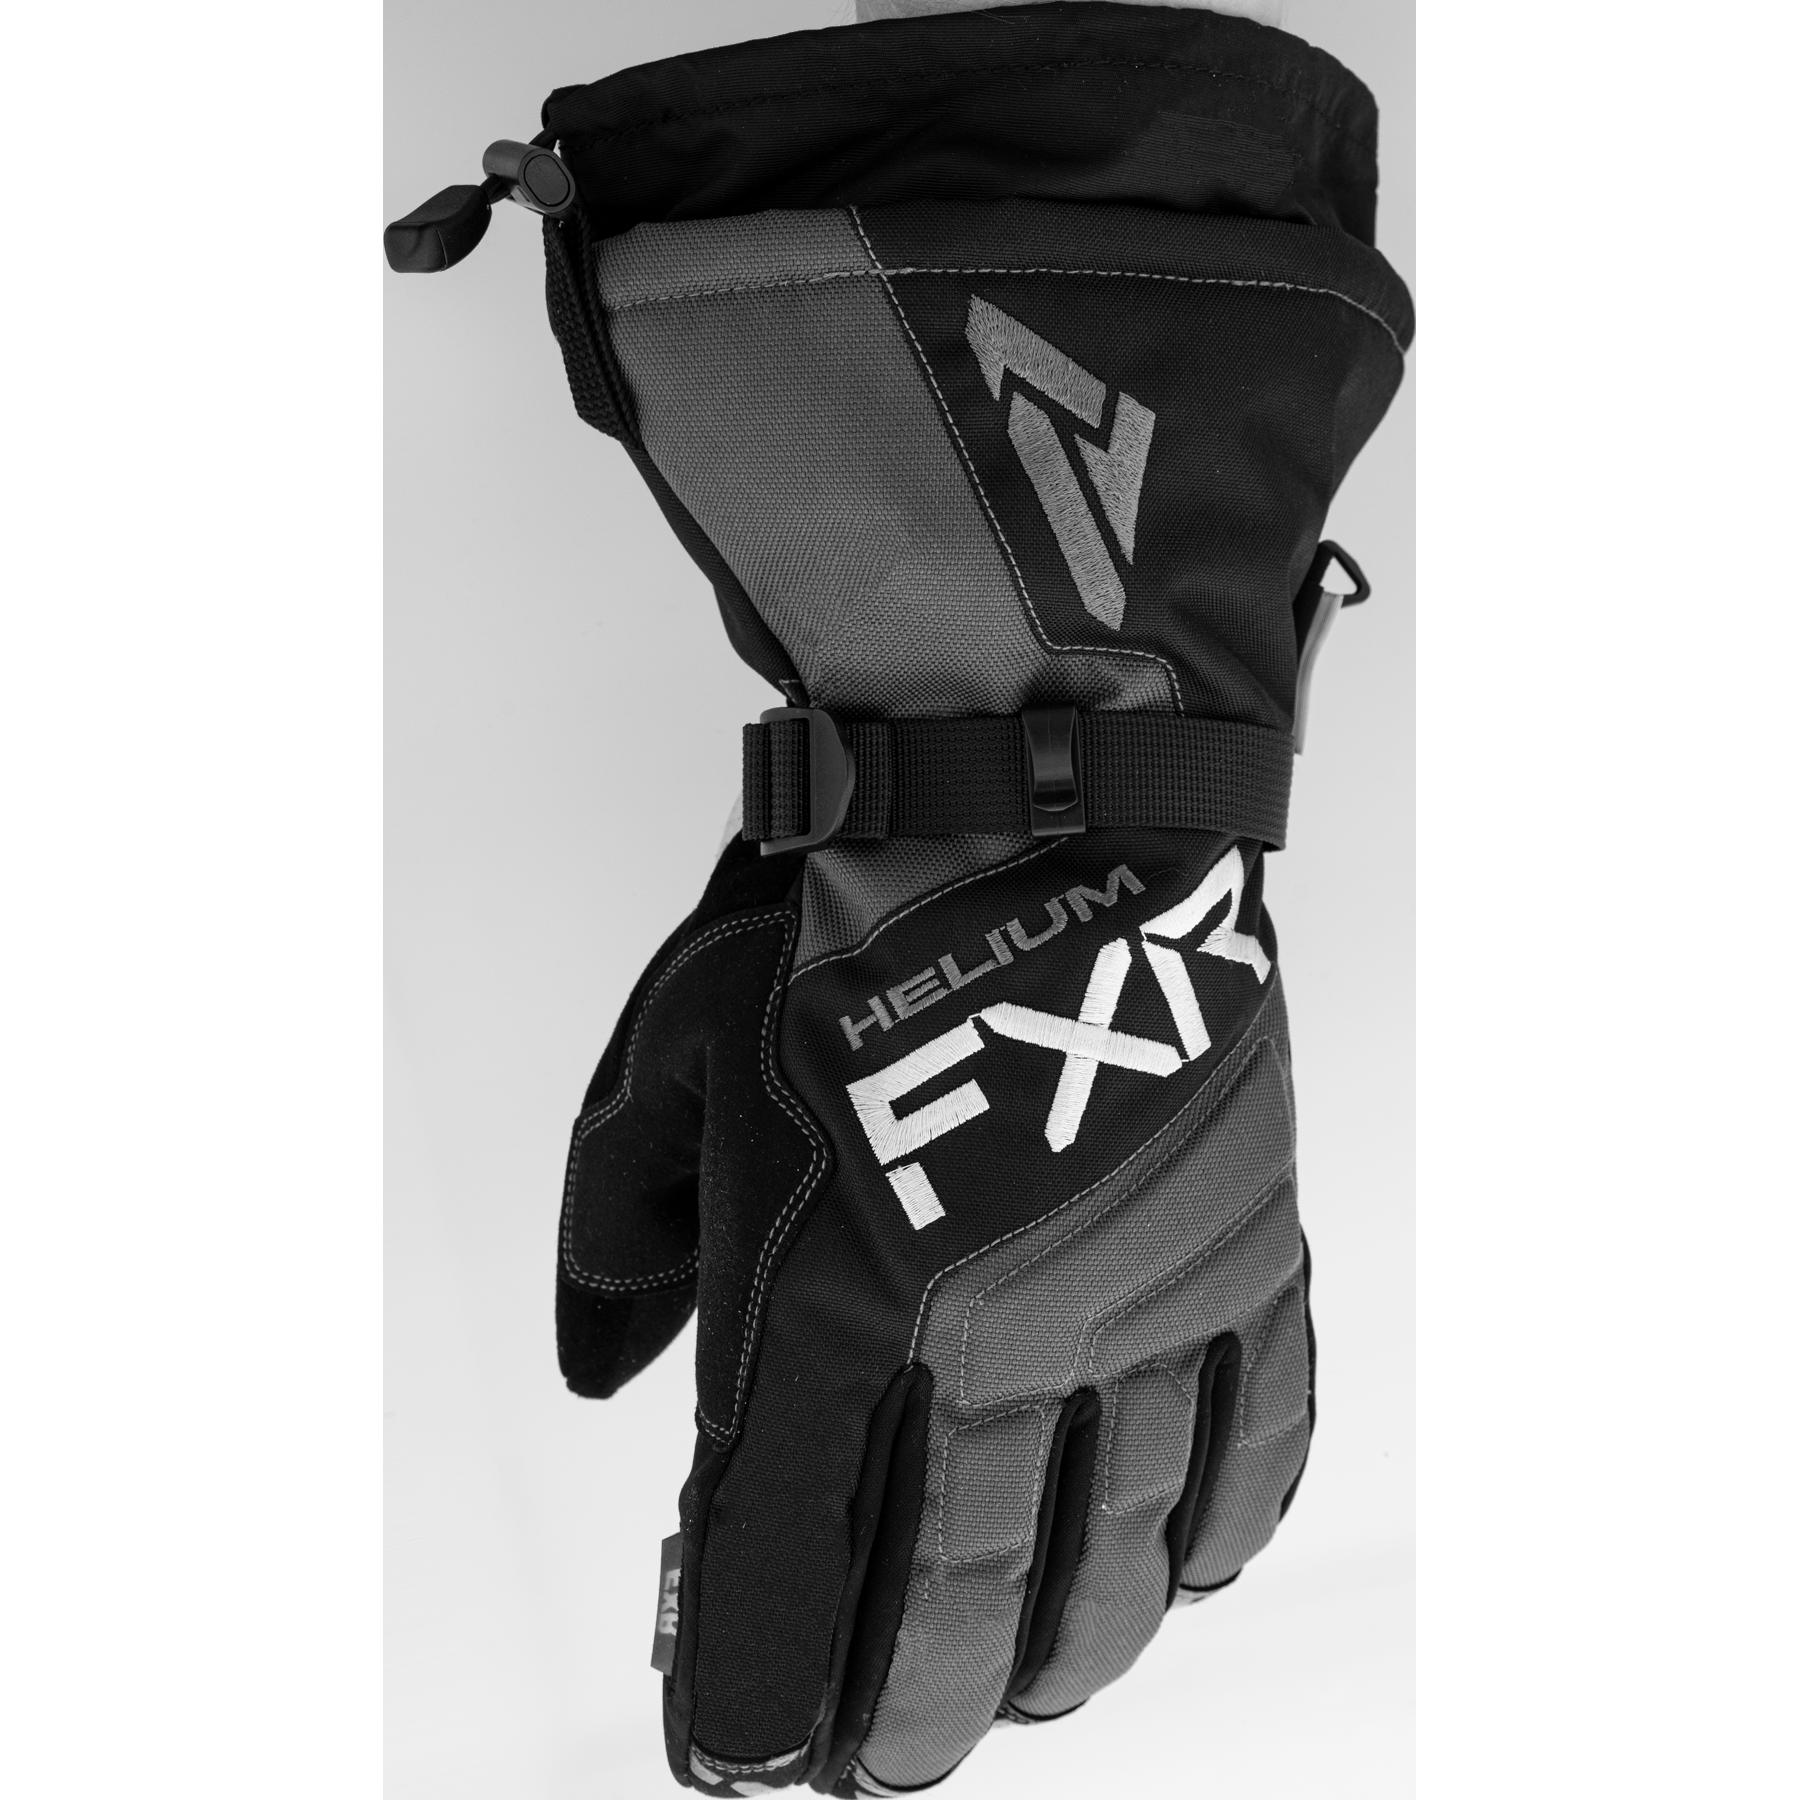 Helium Gauntlet Glove 22 KI 5